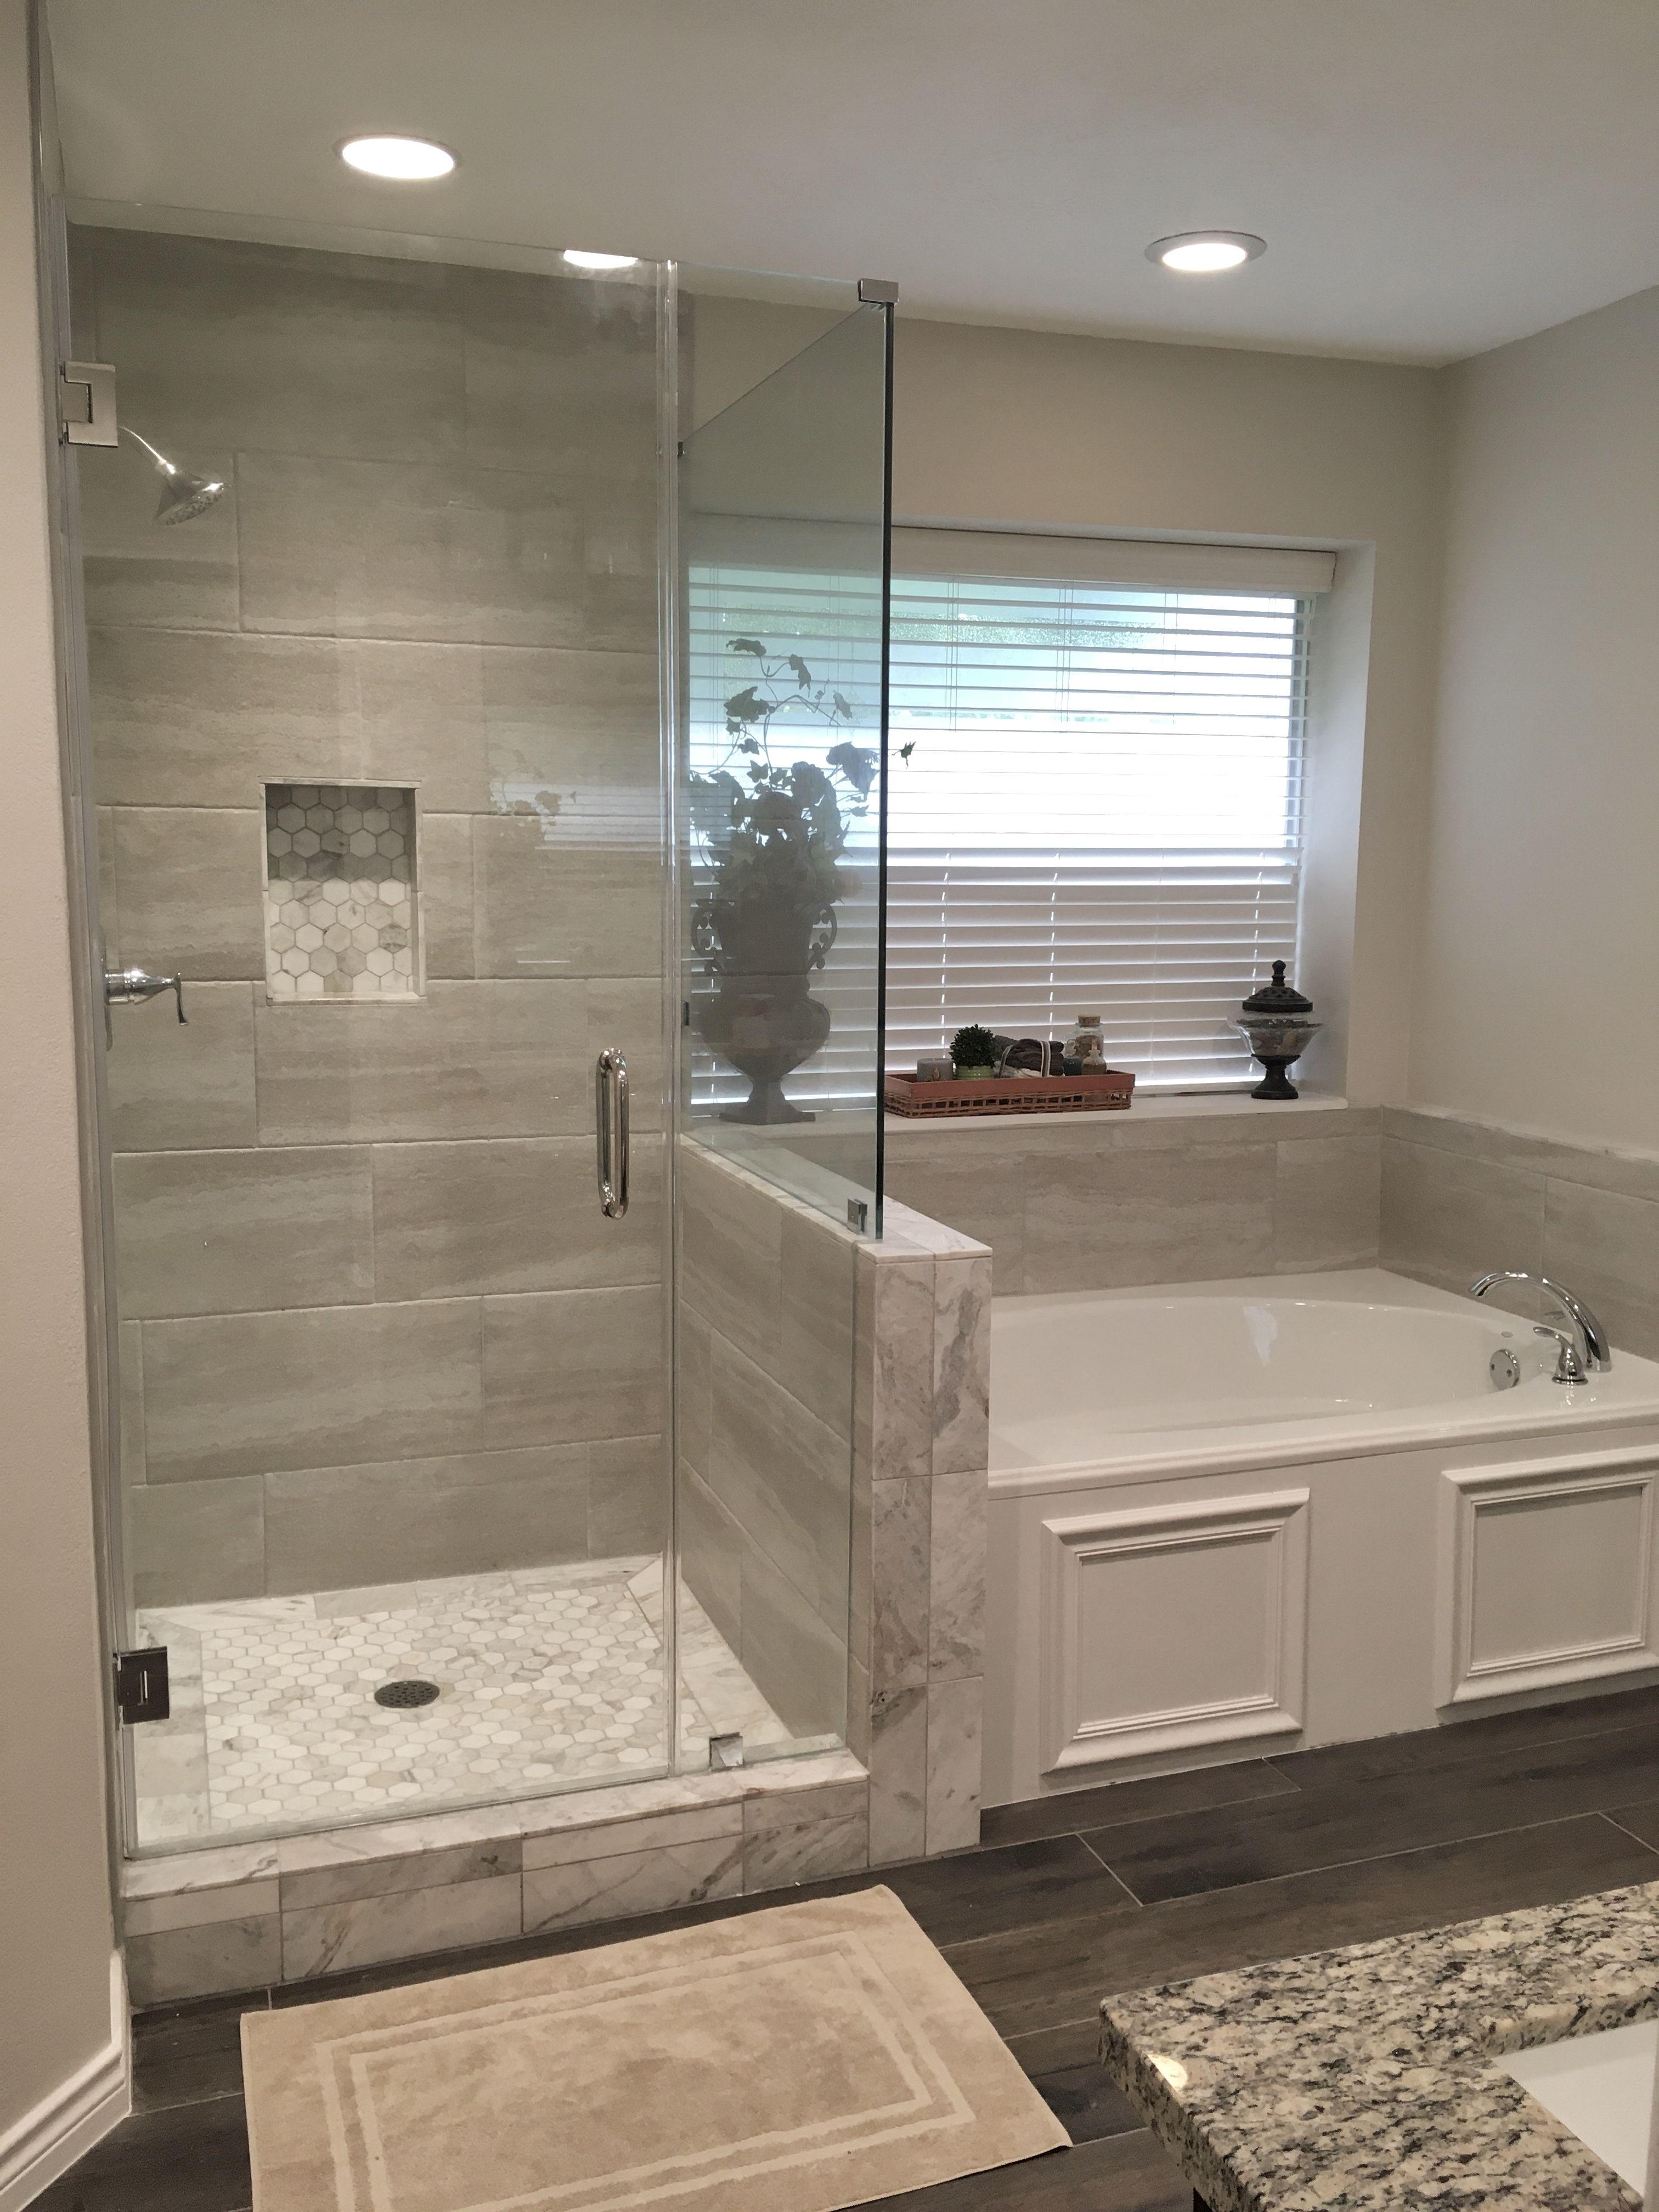 Master Bath Remodel In 2020 Master Bathroom Renovation Bathroom Renovation Cost Bathroom Remodel Master